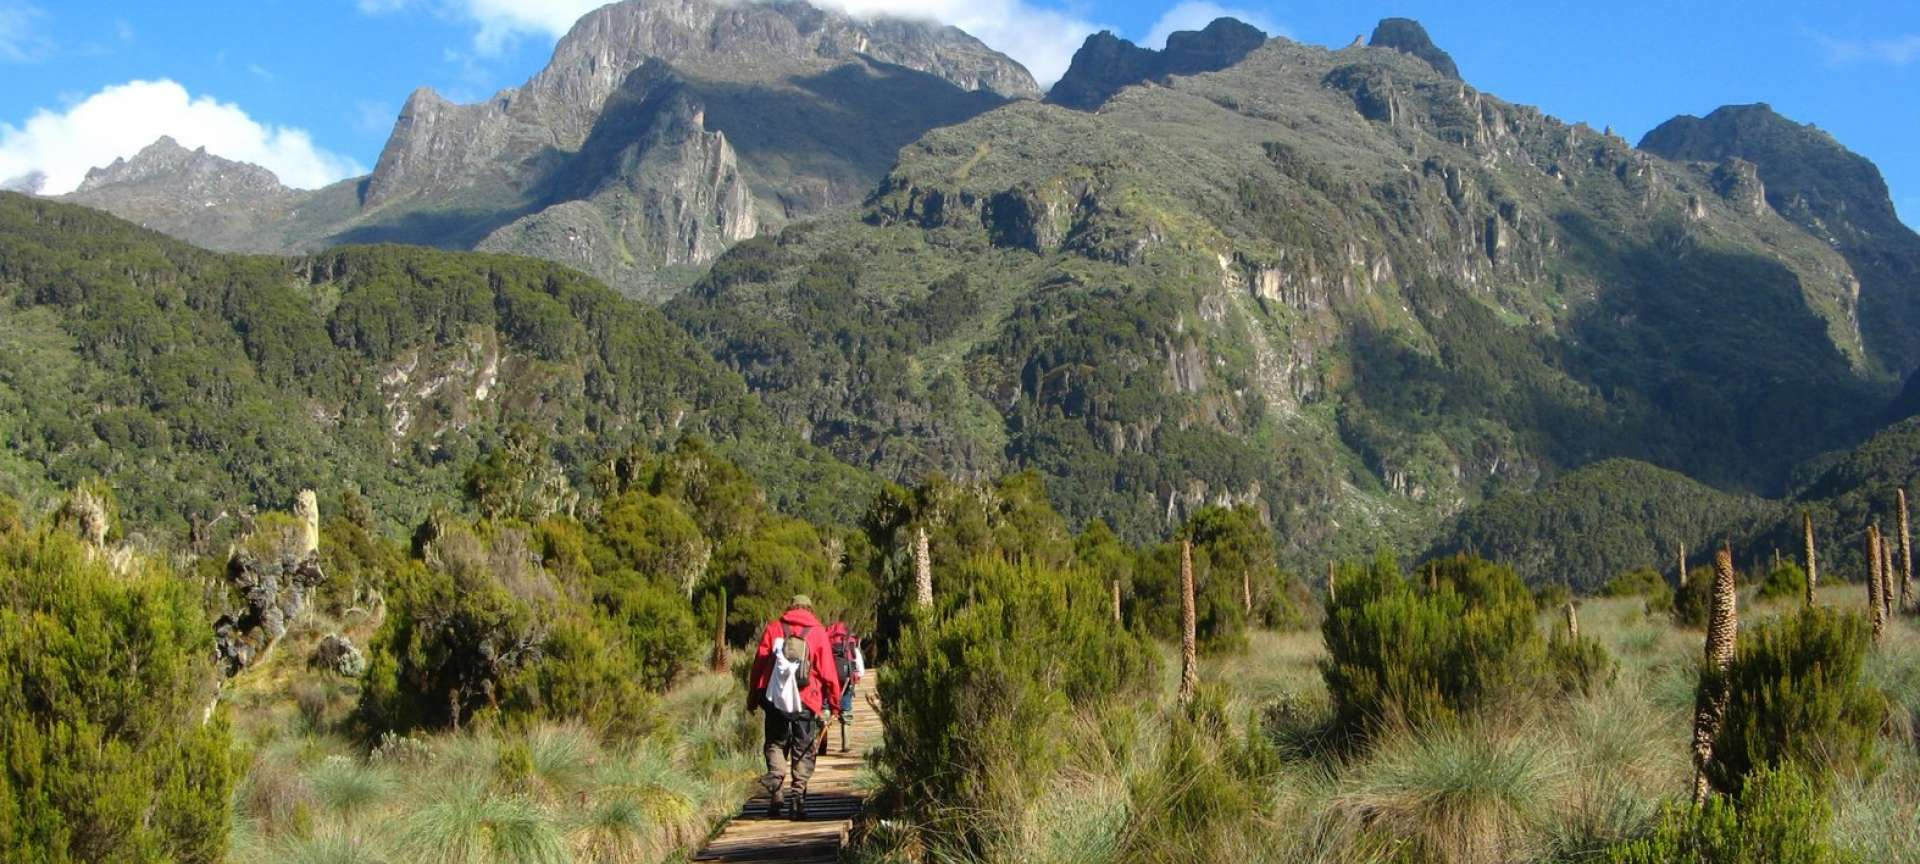 Rwenzori Mountains National Park - Africa Wildlife Safaris